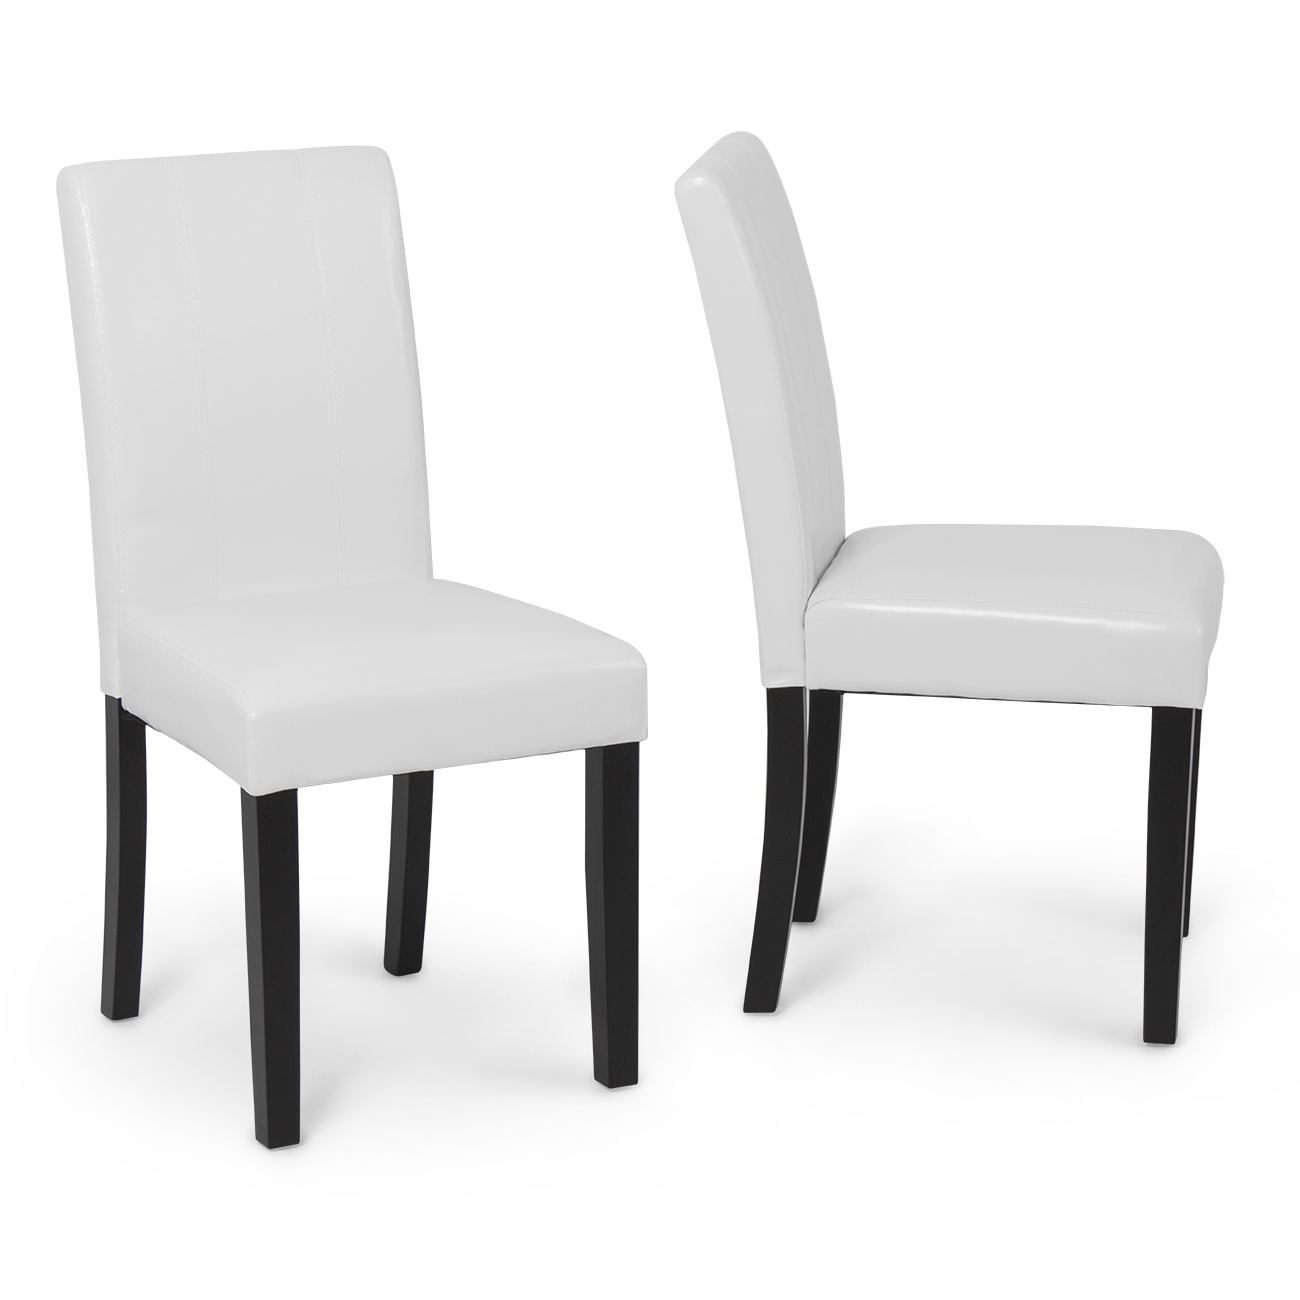 Set of 2 Elegant Design Modern White Leather Parson Dining